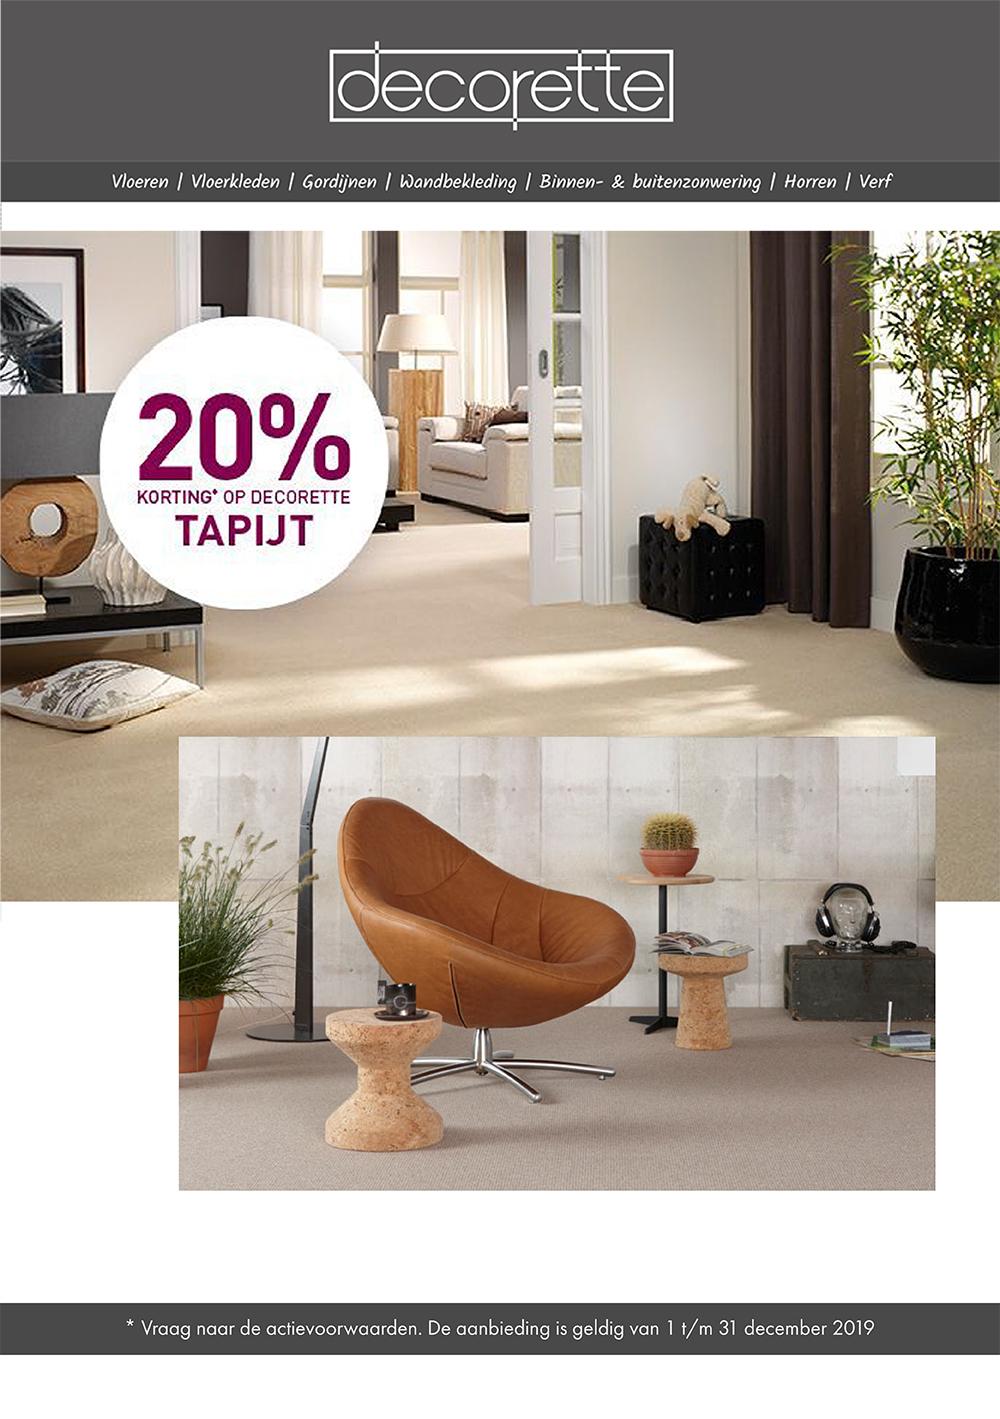 Decorette 20% korting tapijt